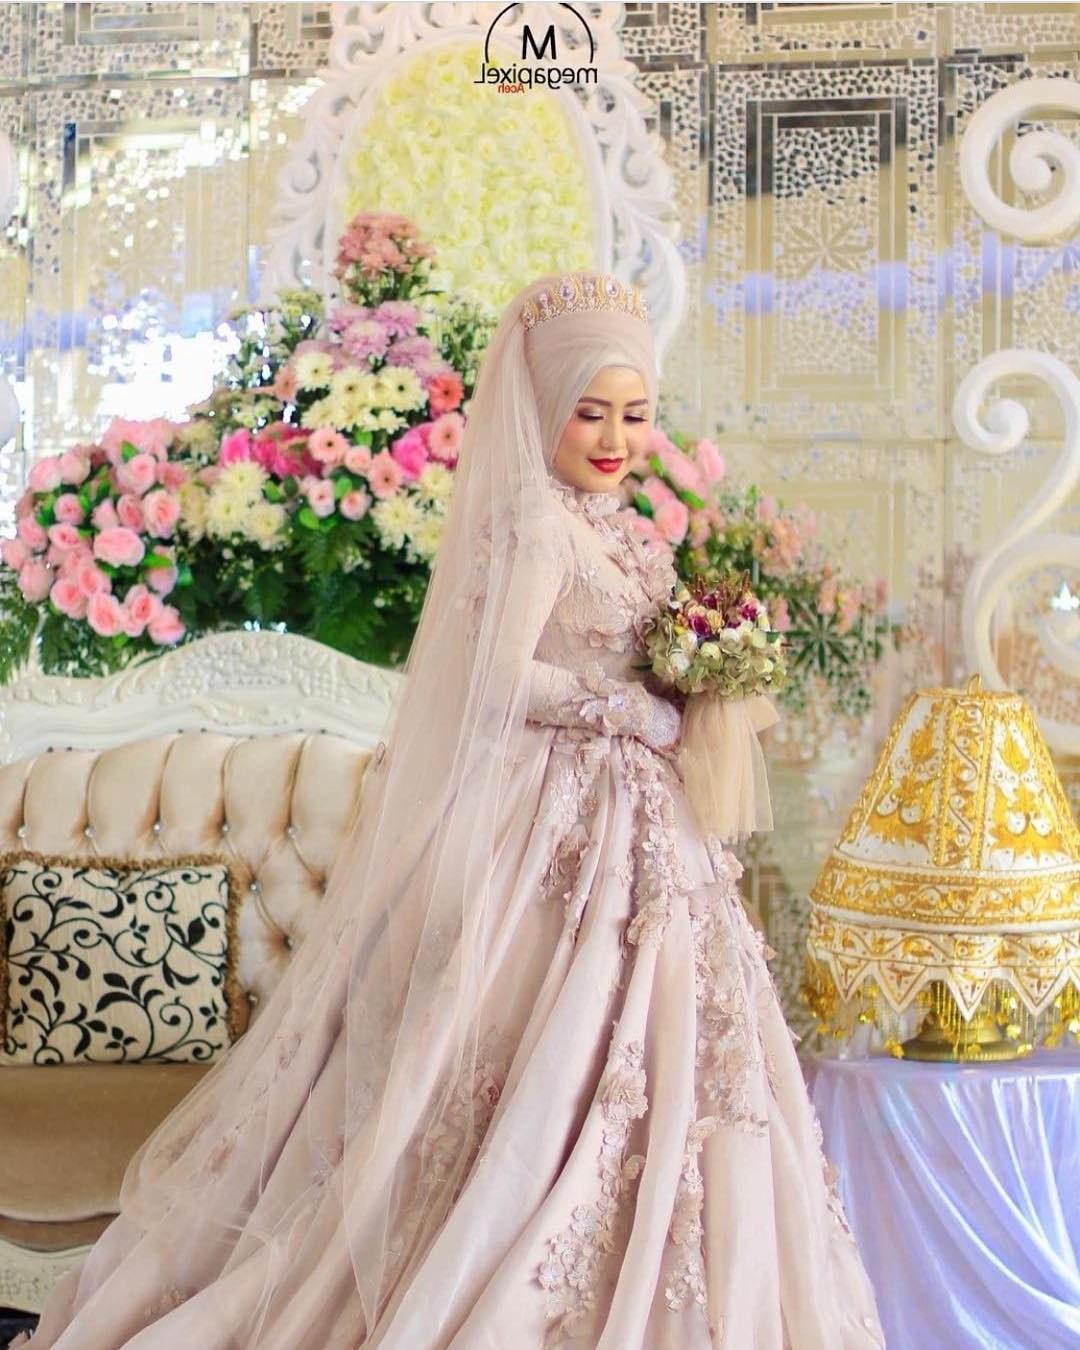 Bentuk Harga Gaun Pengantin Muslimah Syar'i Mndw 17 Model Baju Pengantin Muslim 2018 Desain Elegan Cantik